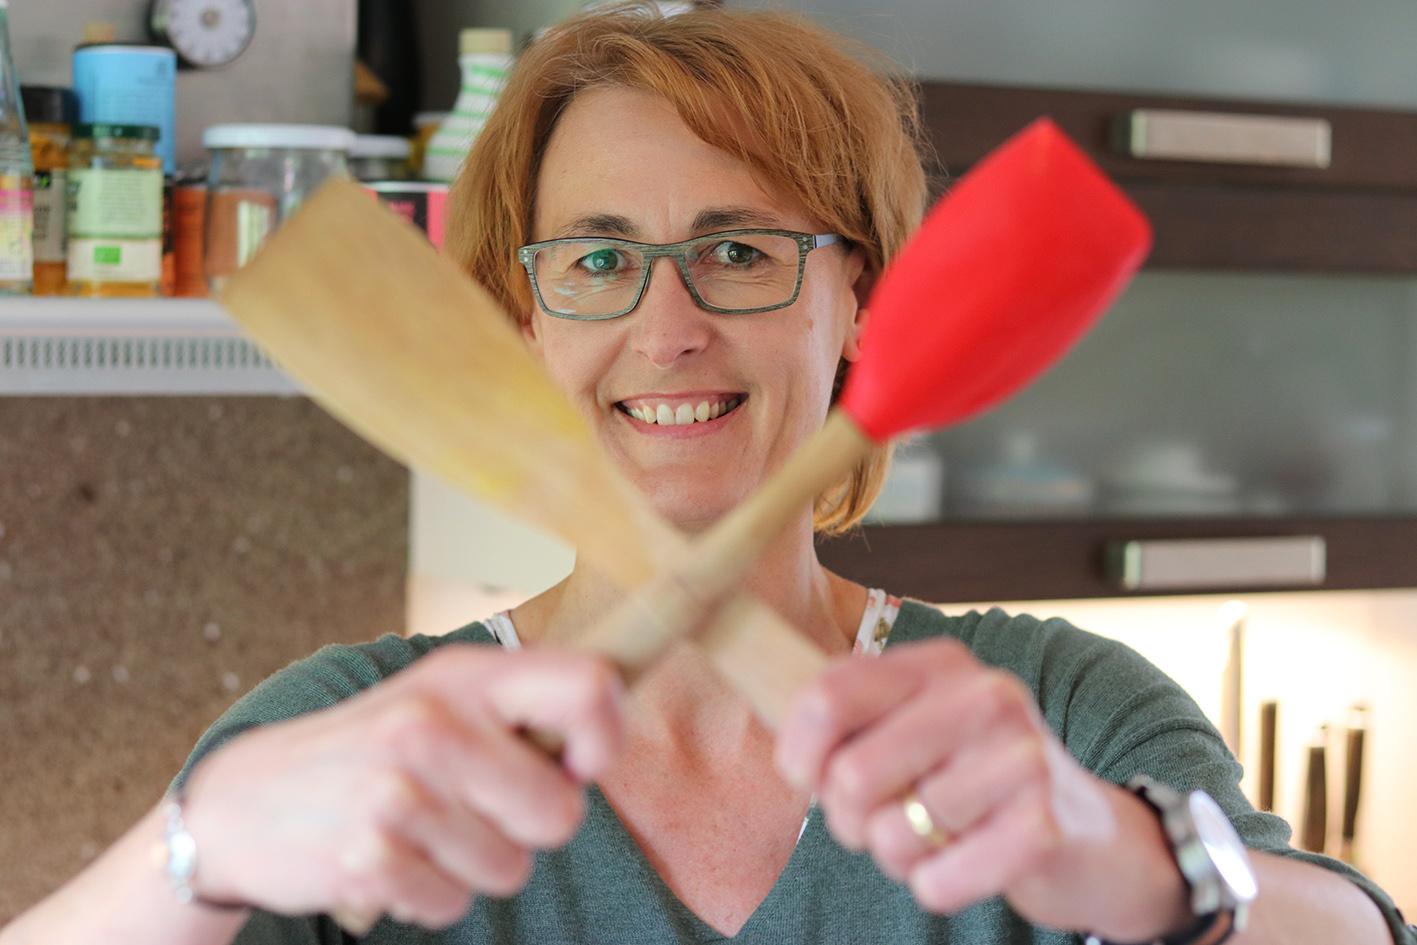 Gundi Goeritz mit gekreuzten Kochlöffeln